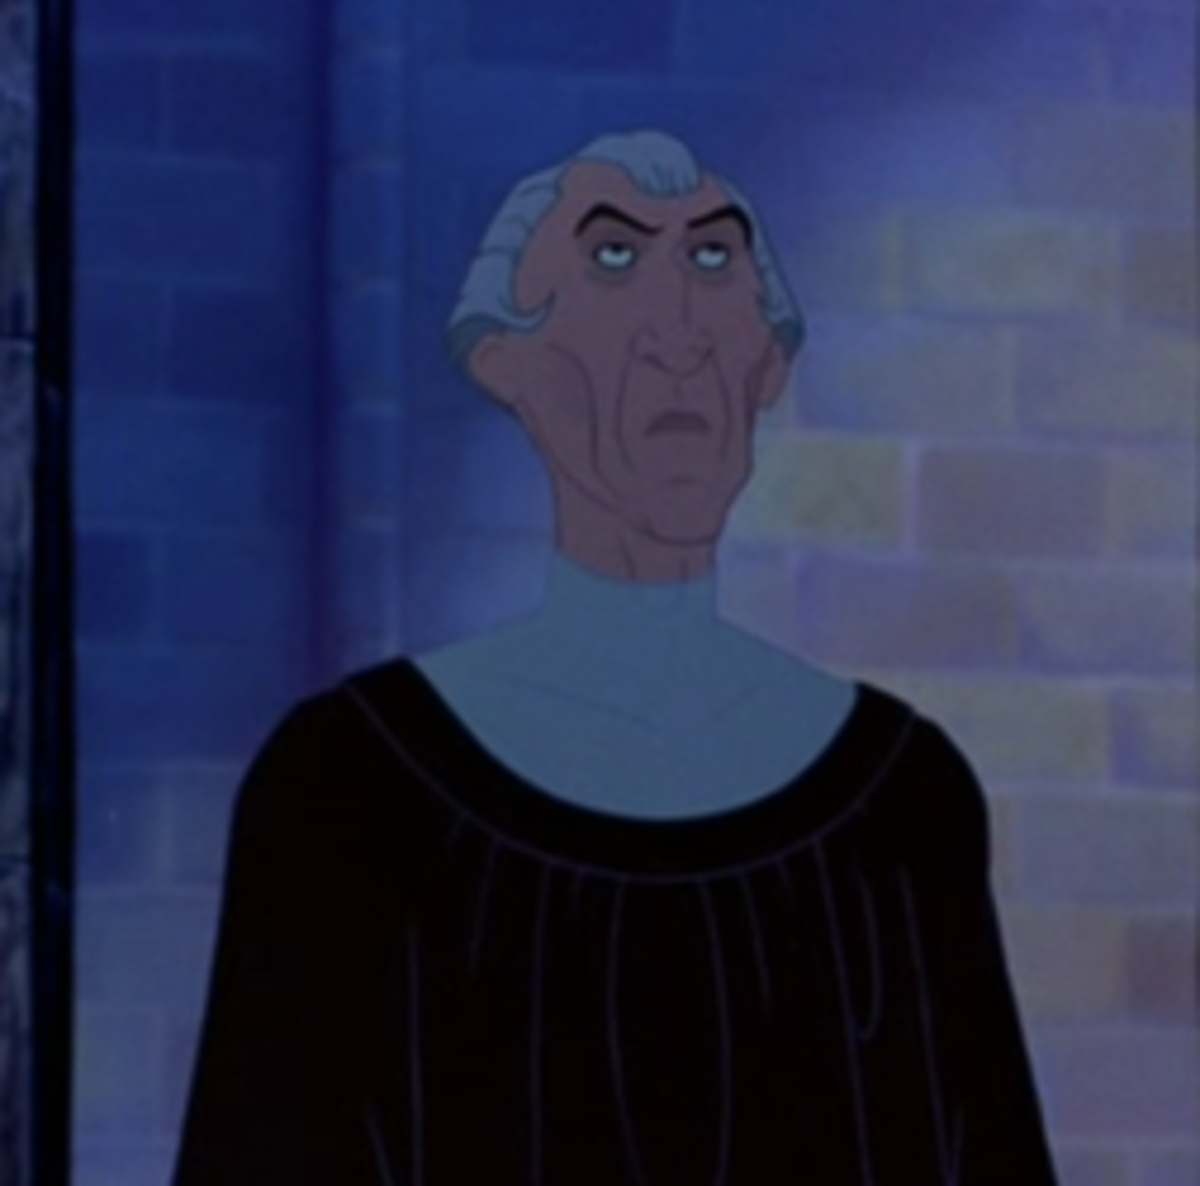 Disney Frollo